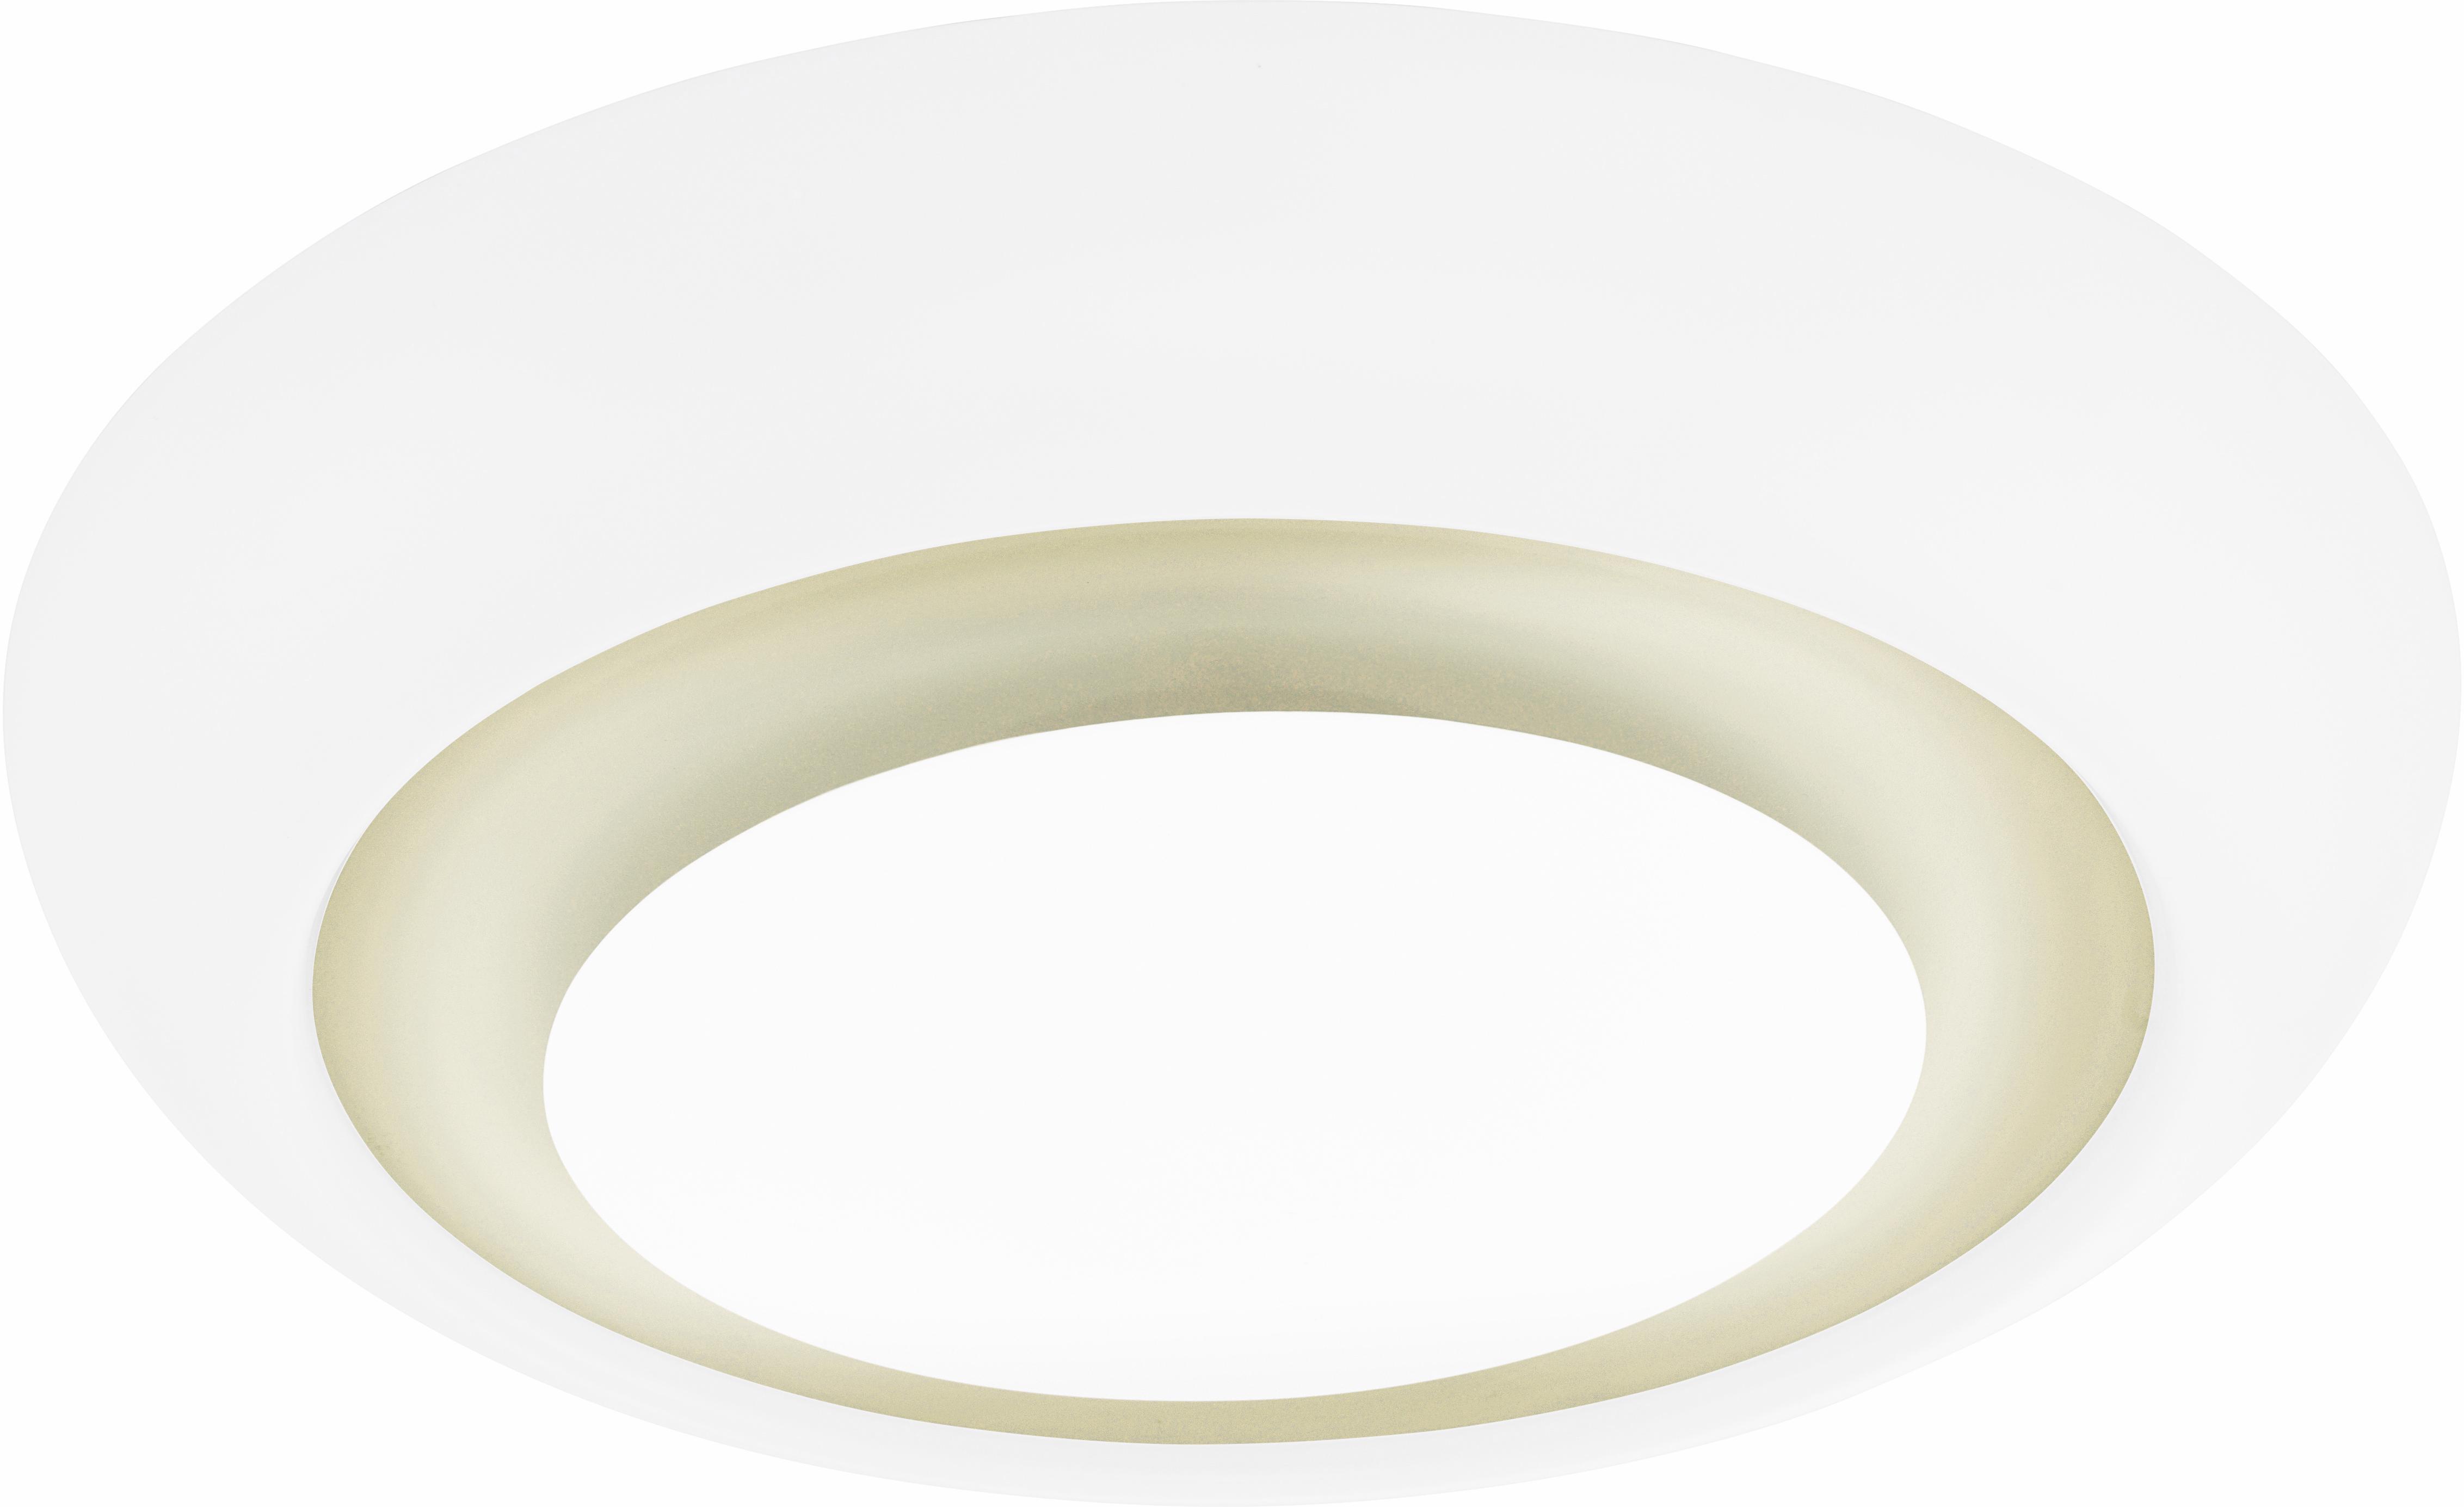 EGLO LED Deckenleuchte CANUMA, LED-Board, Extra-Warmweiß-Kaltweiß-Neutralweiß-Tageslichtweiß-Warmweiß, Memory function, CCT, 5-step dimming